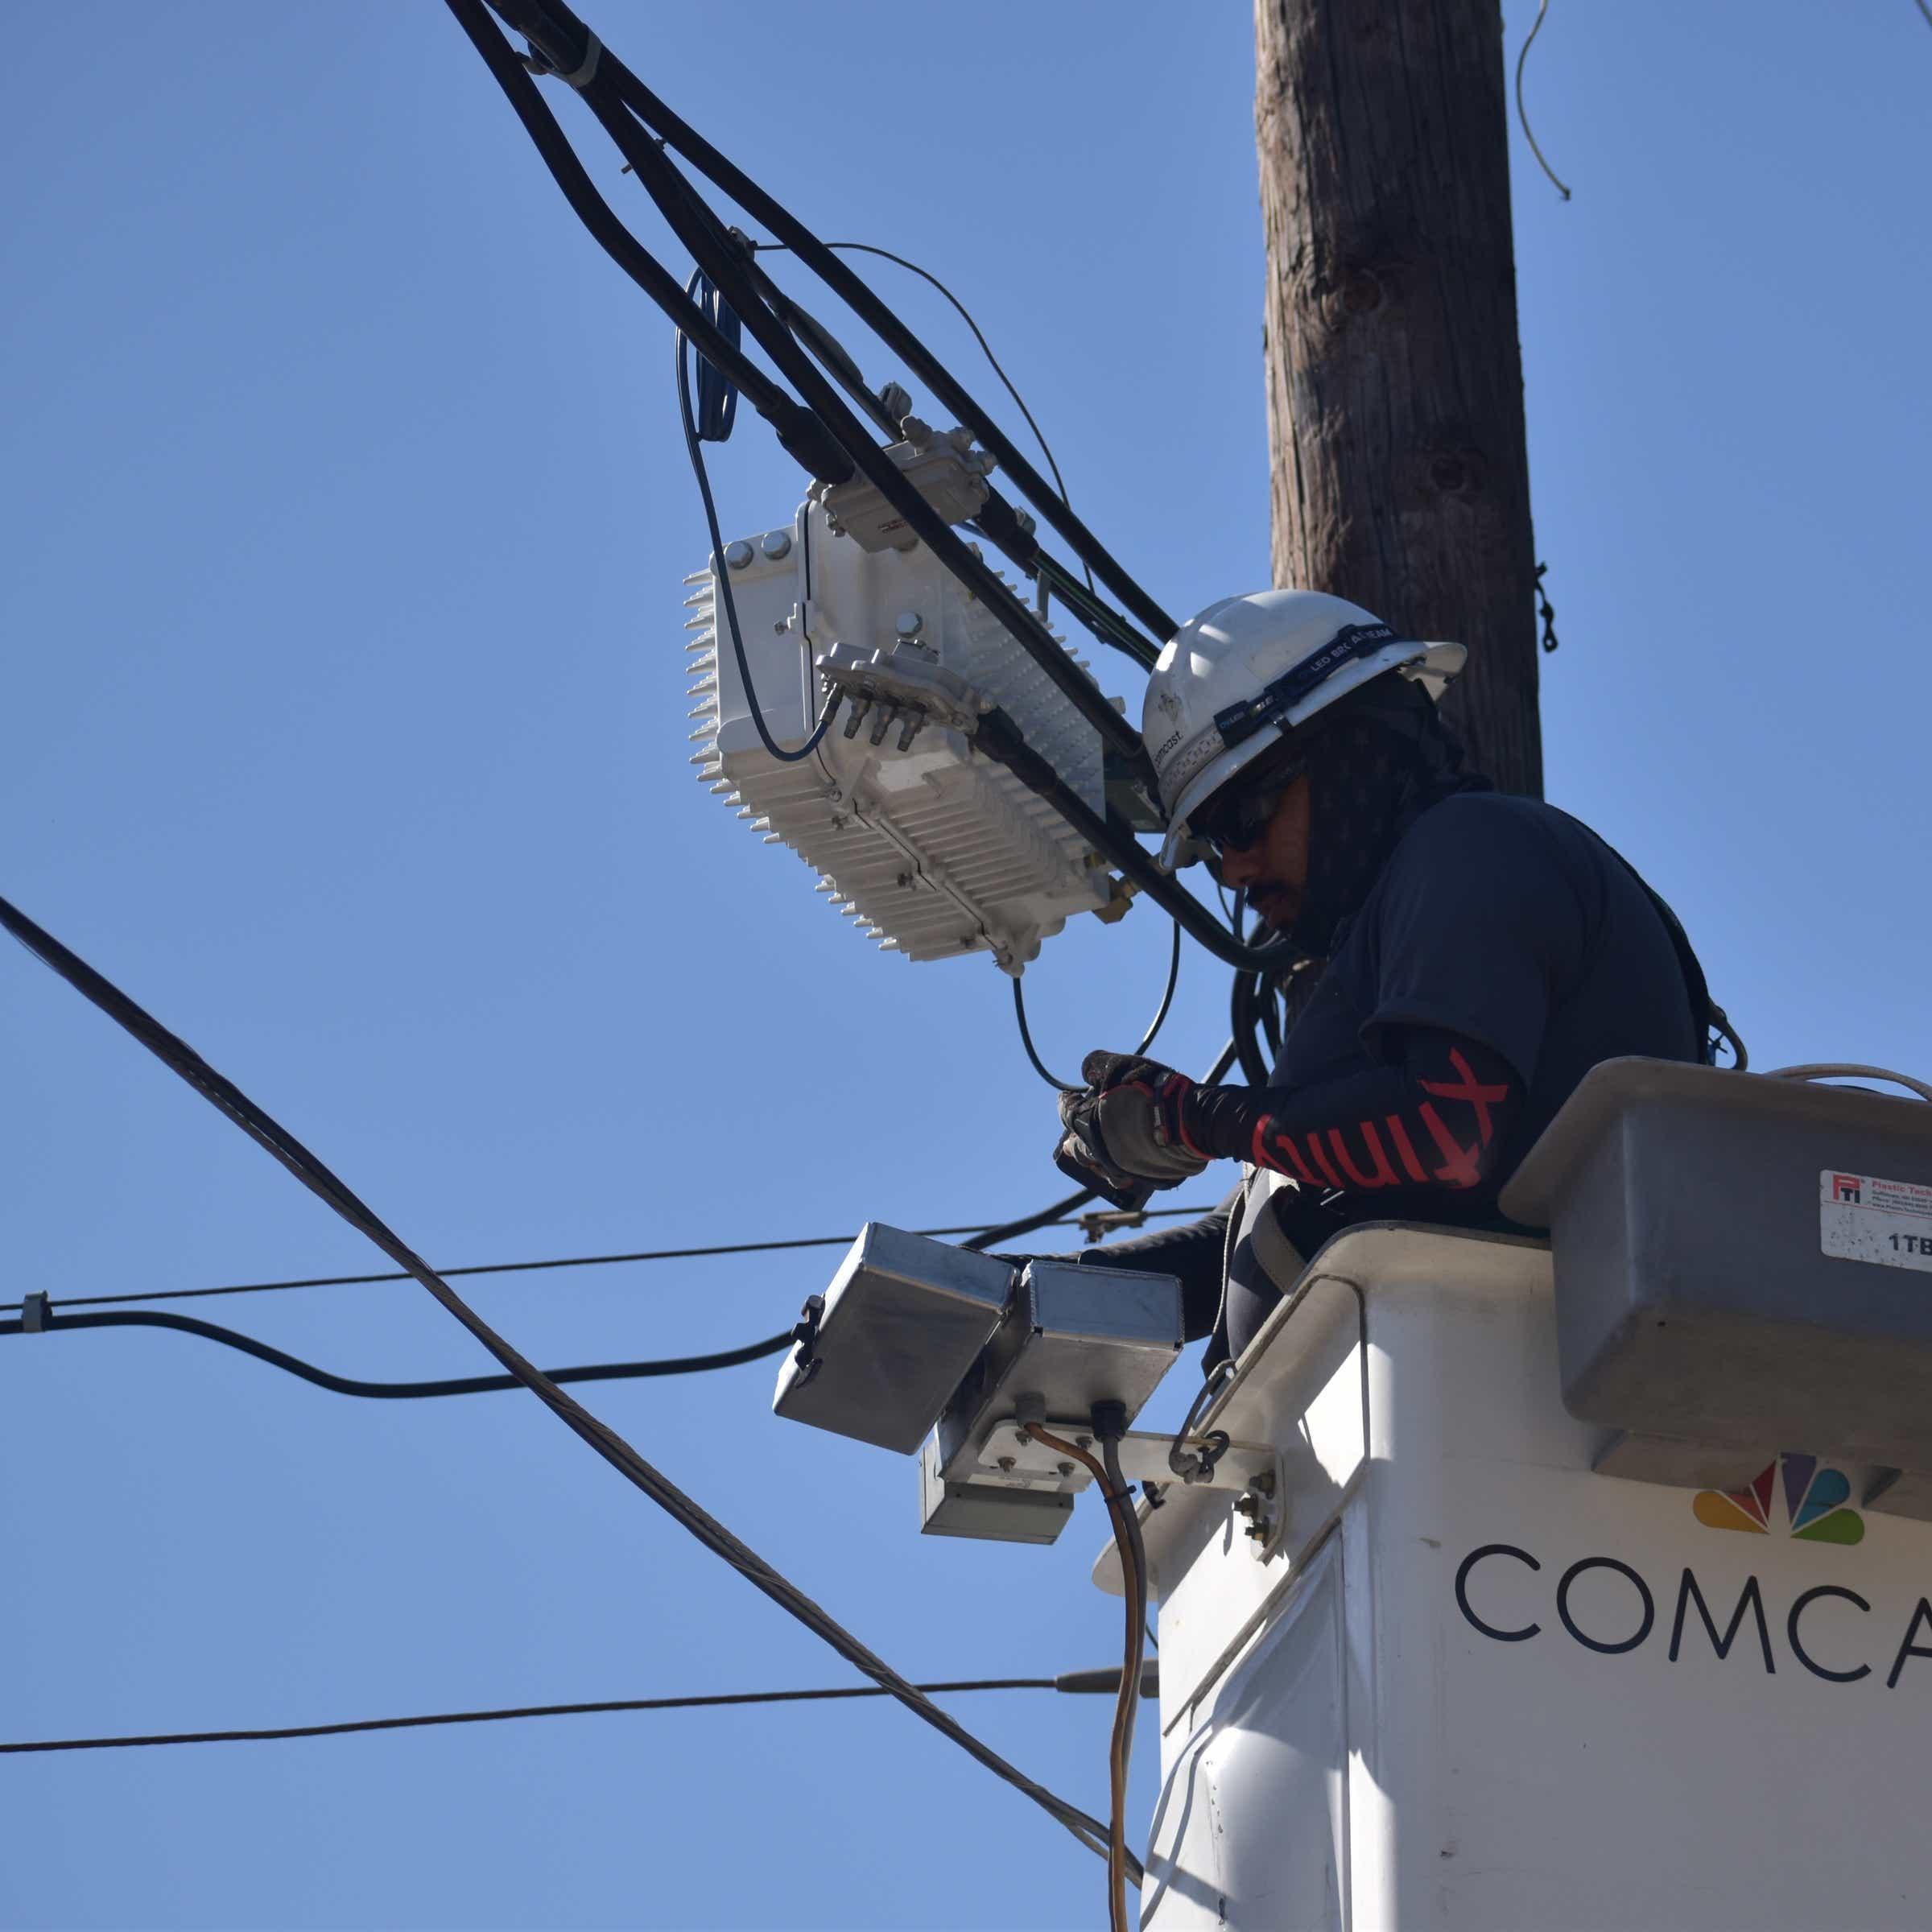 cable-tv-installer-job-responsibilities